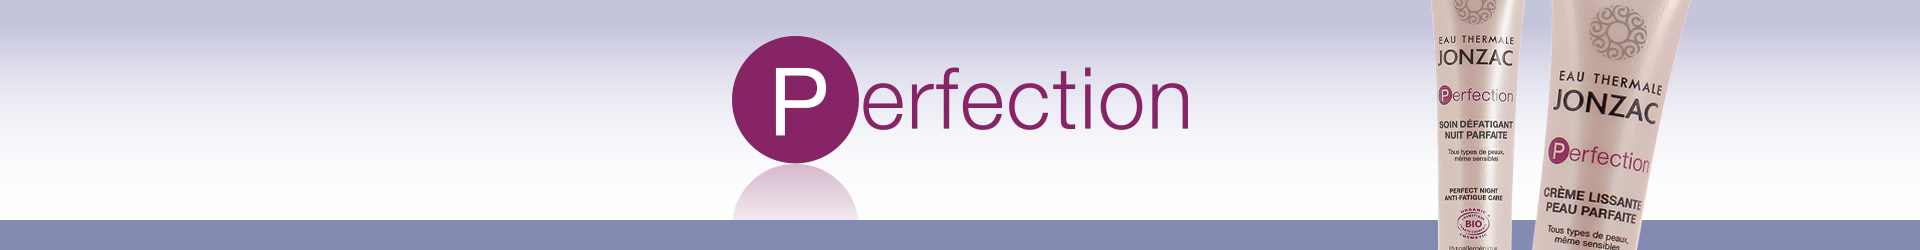 gamme-perfection-jonzac